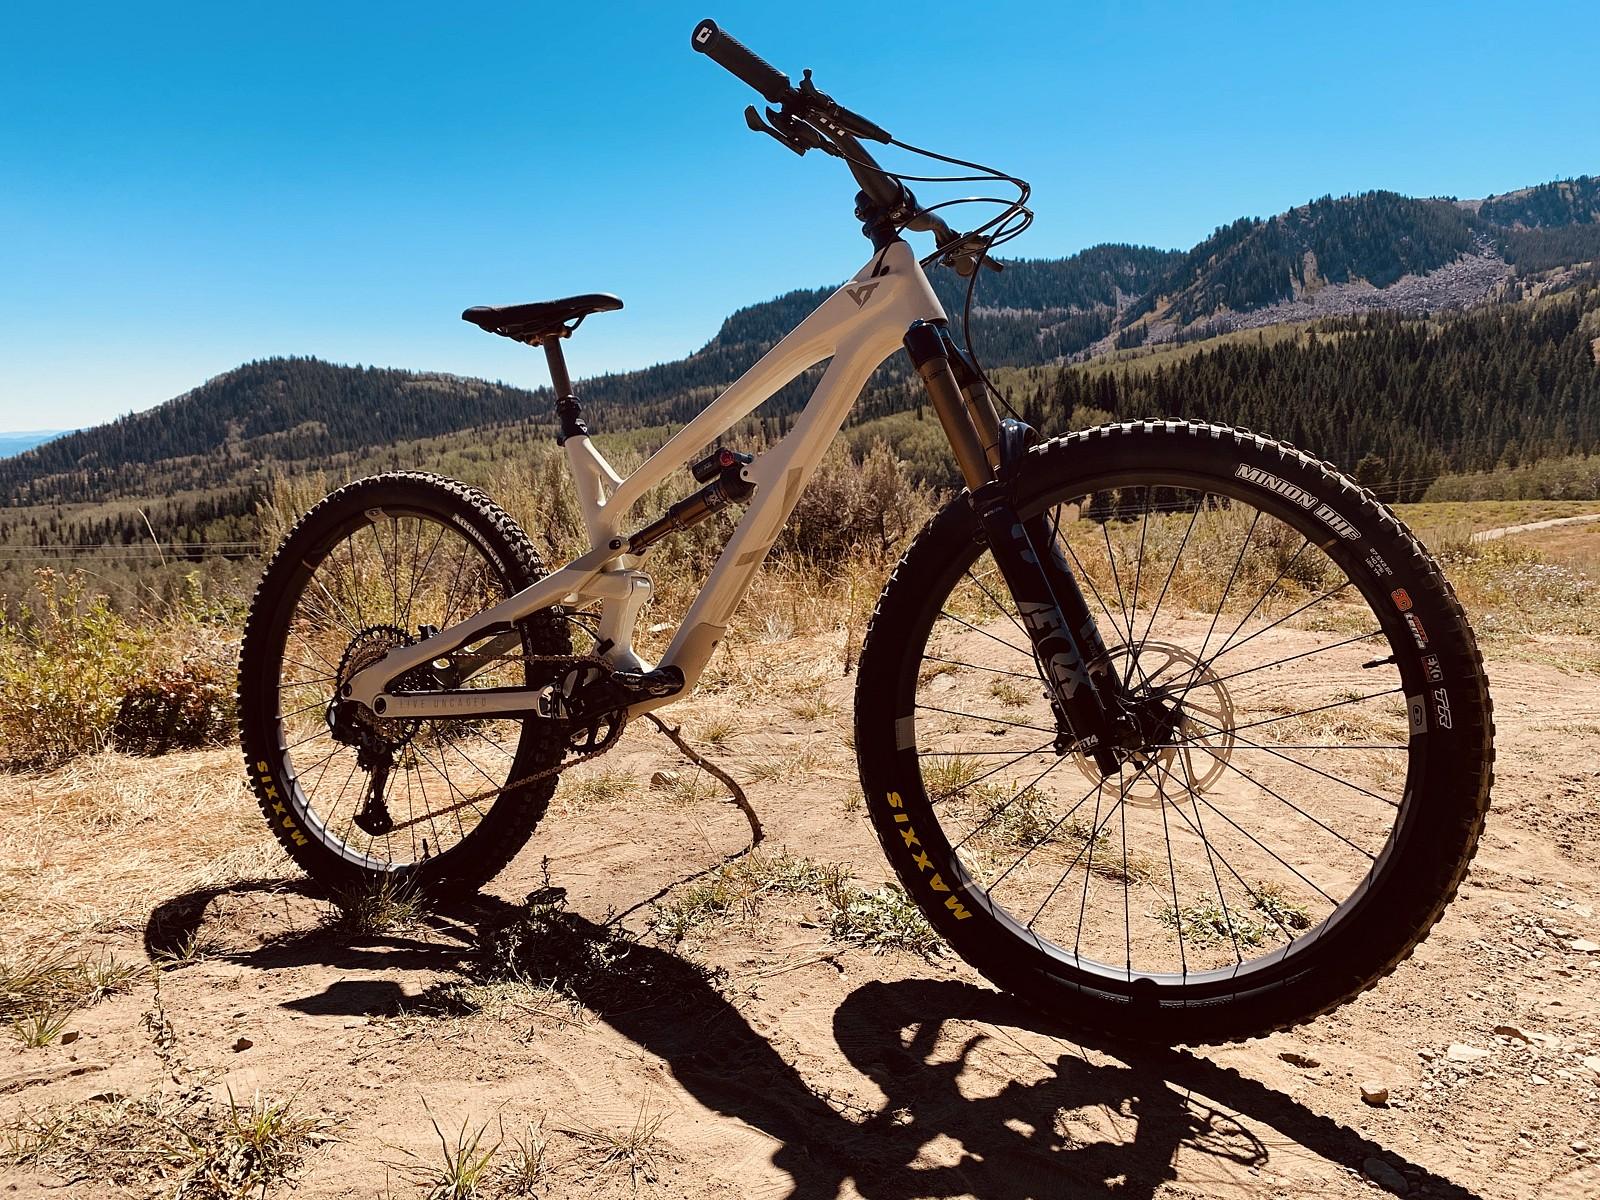 IMG E0208 - jaykalafatis - Mountain Biking Pictures - Vital MTB